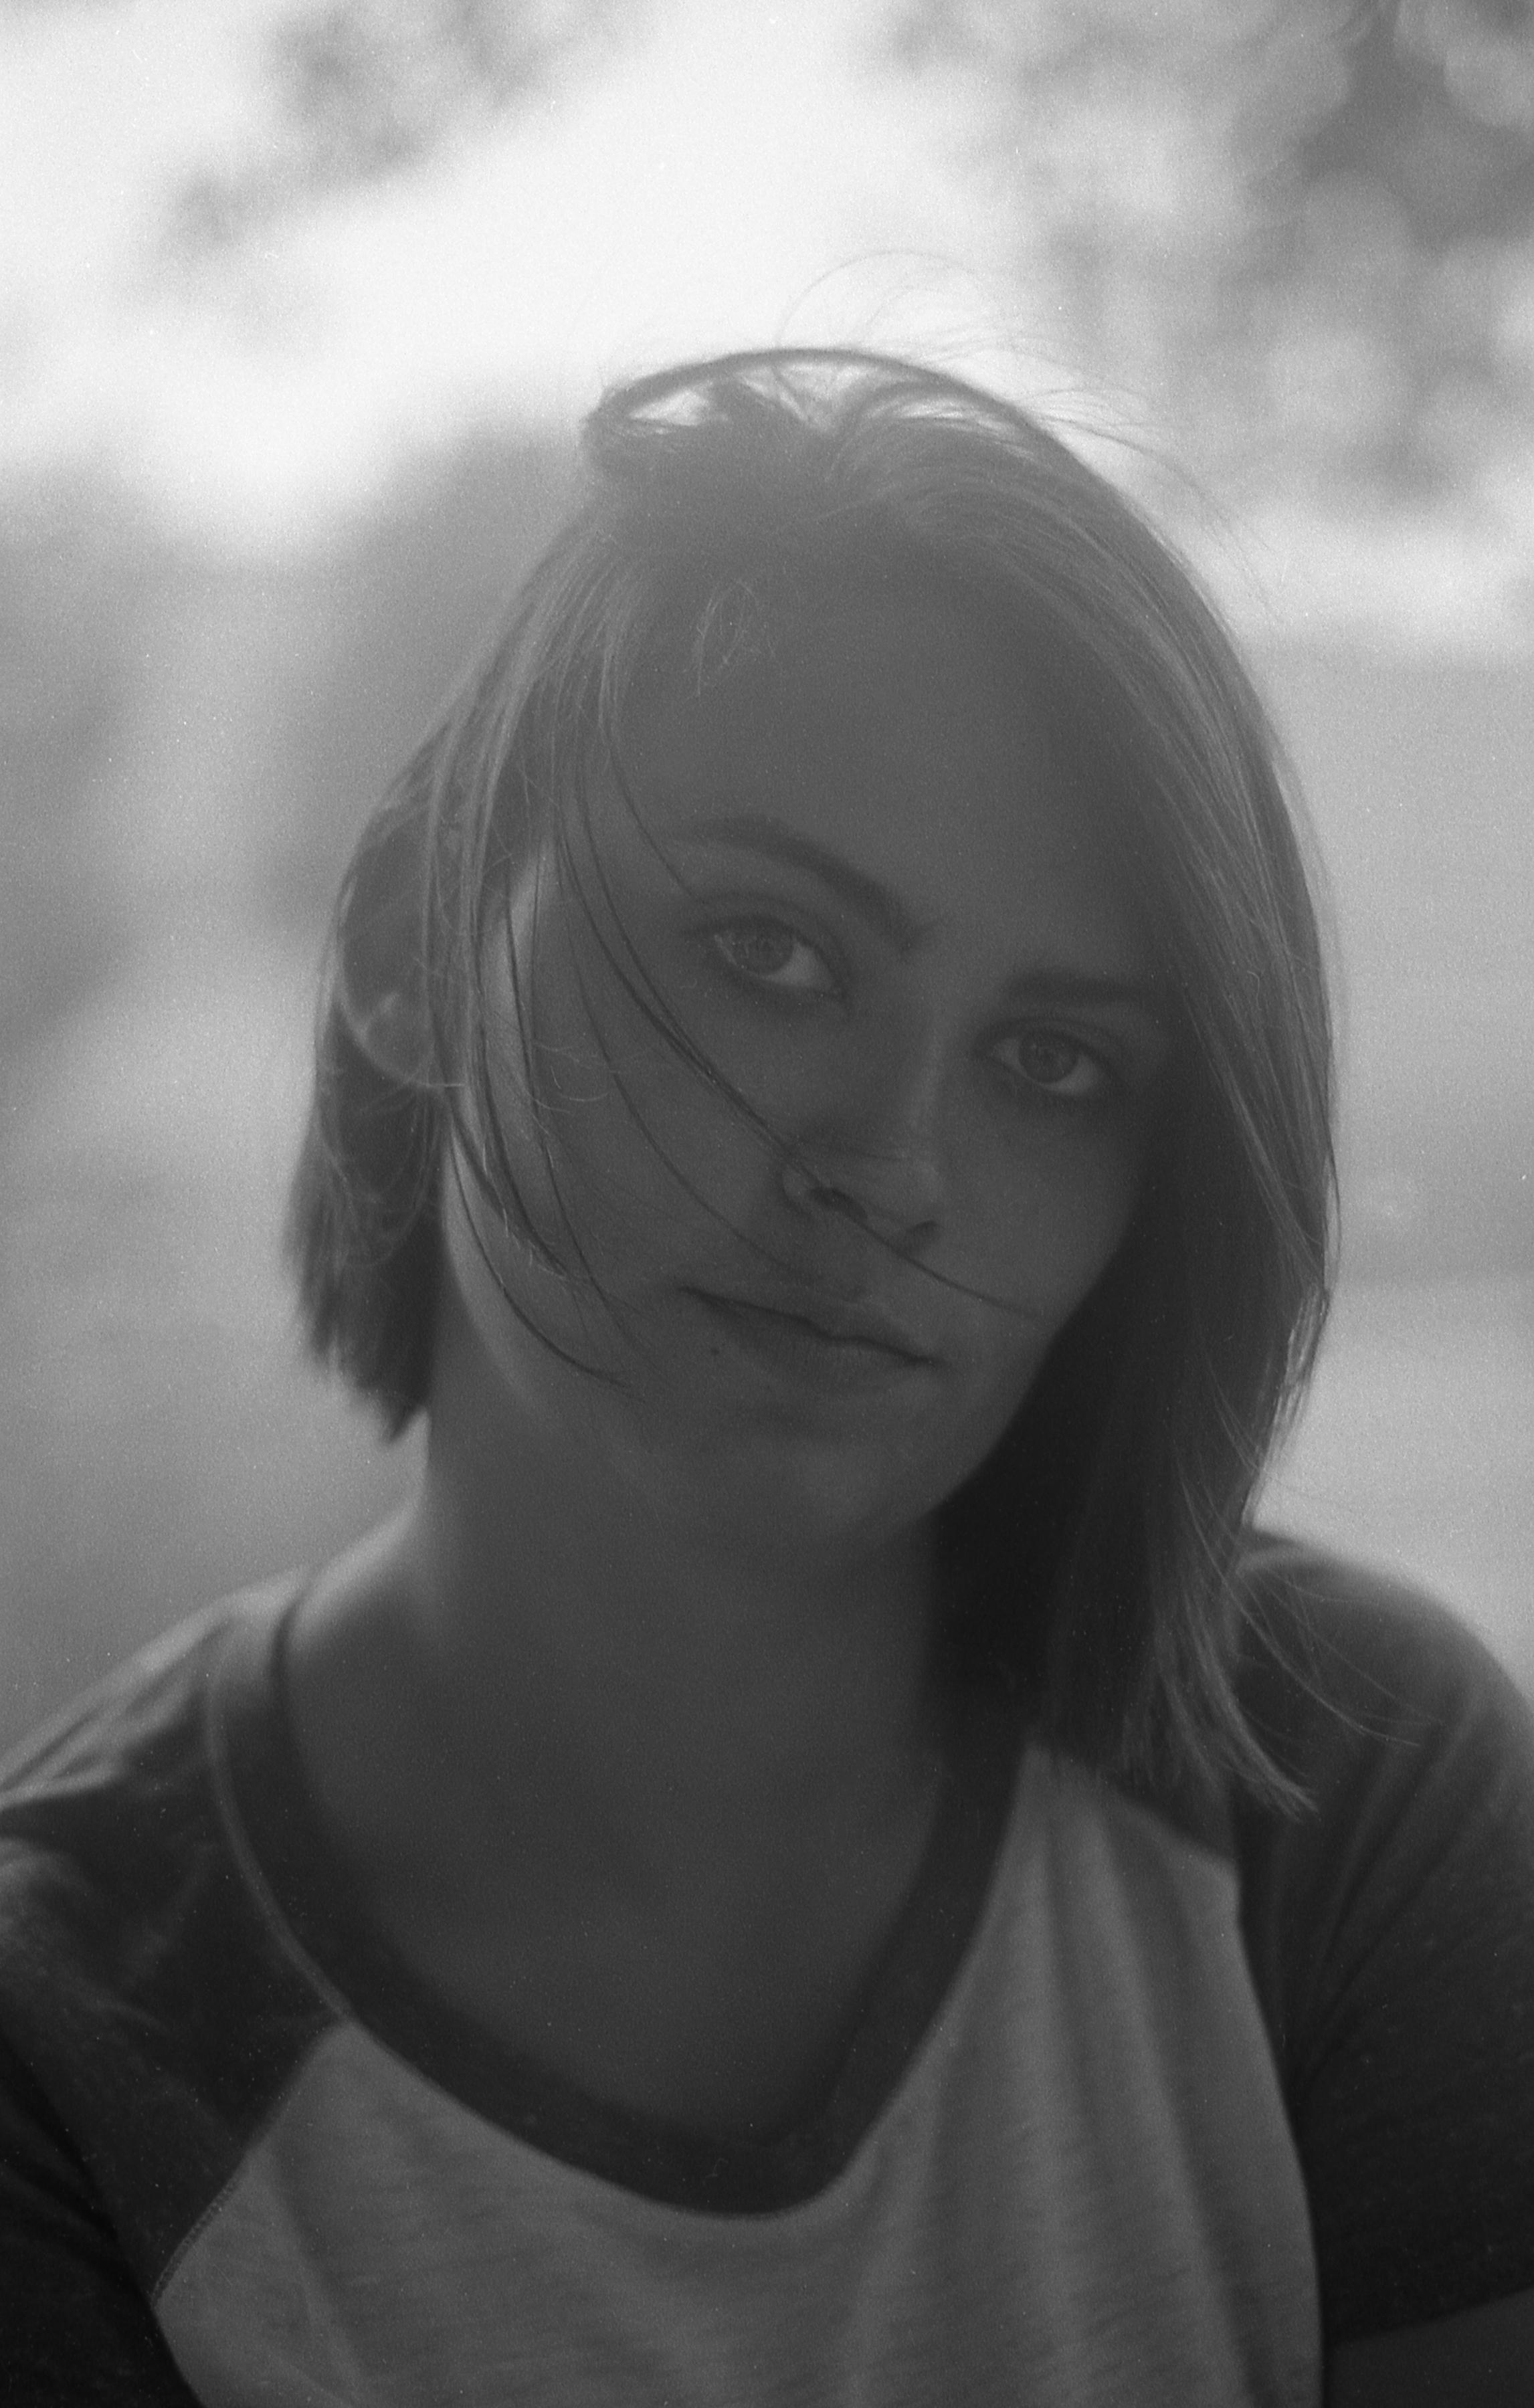 Emily Elizabeth Breeden - By Lindsey CollinsEmily Elizabeth Breeden is a force to be reckoned with. Often mistaken for a